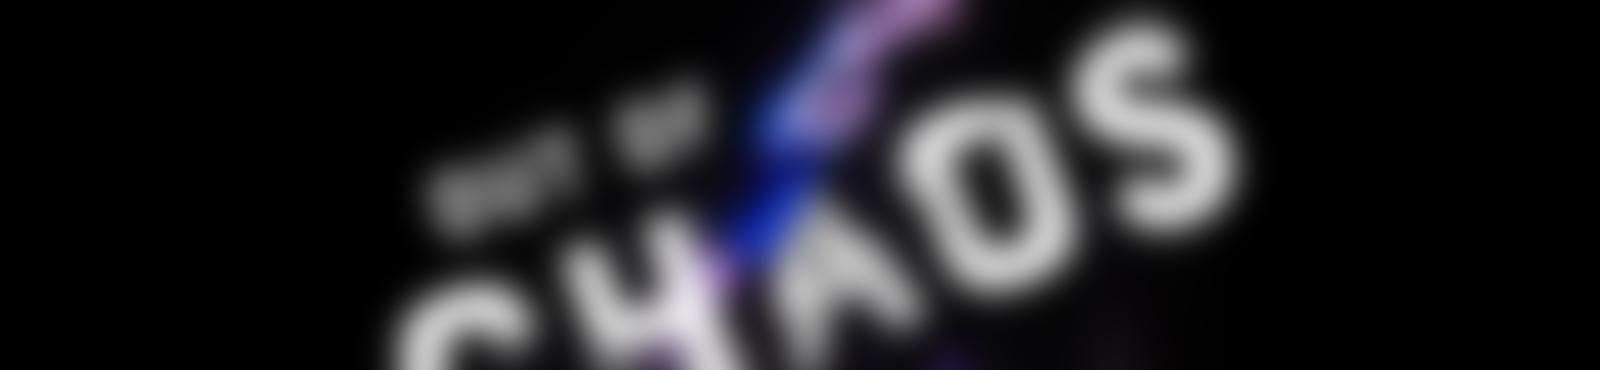 Blurred 3cb61dc2 d18d 4d2c 93c6 b17007893442